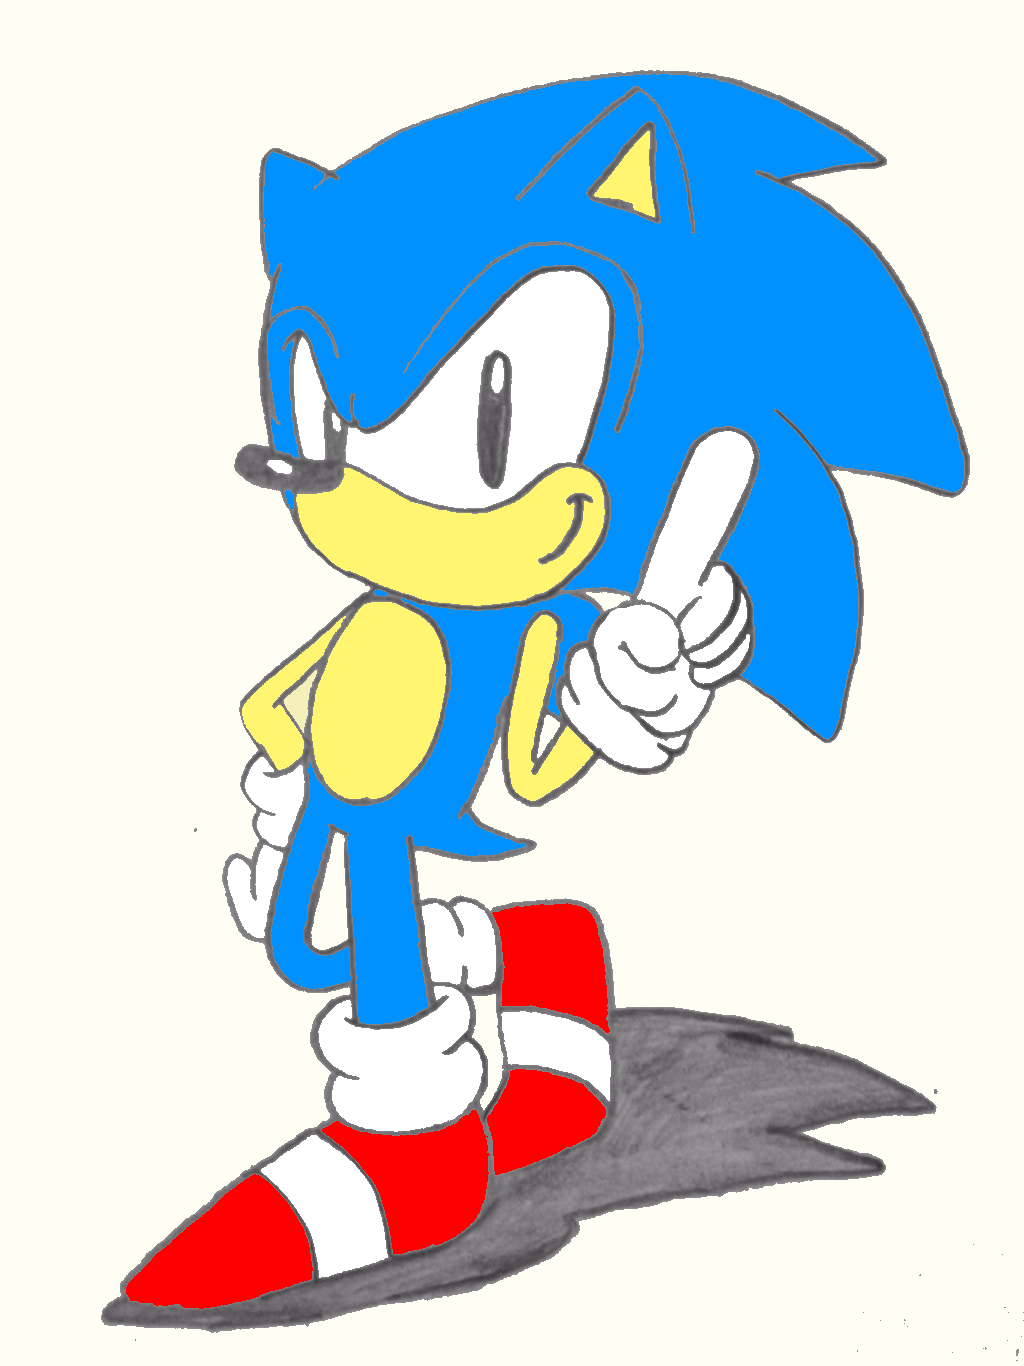 Sonic The Hedgehog 16 Bit Cartridge By Modernsonic1223 On Deviantart